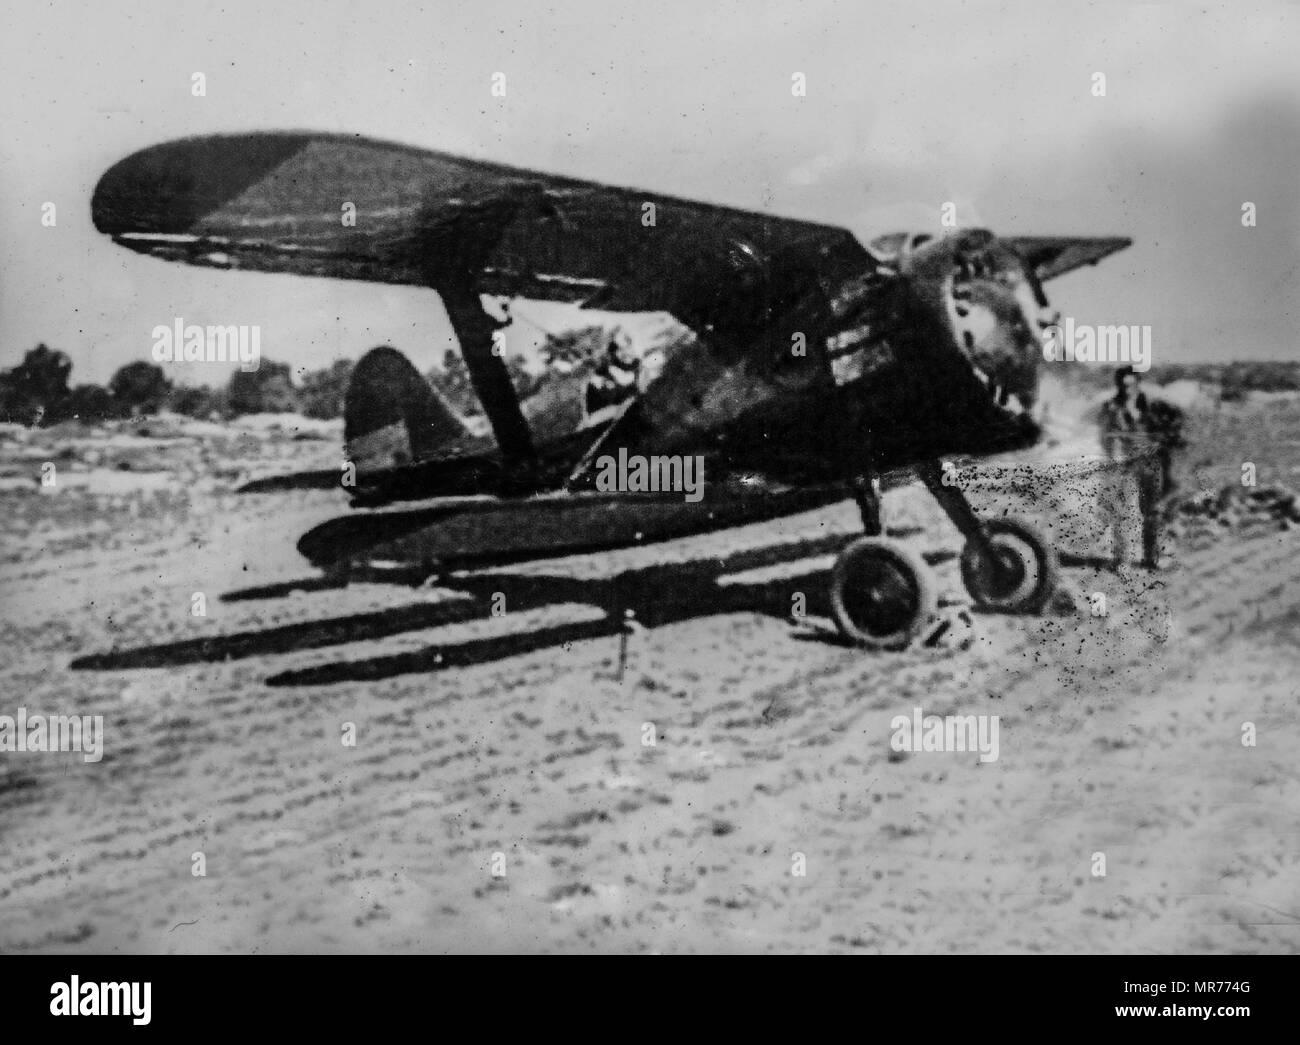 Saceruela, Spain - 2017 September 2nd: Damaged pictures taken at Saceruela Republican aviation aerodrome, Ciudad Real, Spain - Stock Image